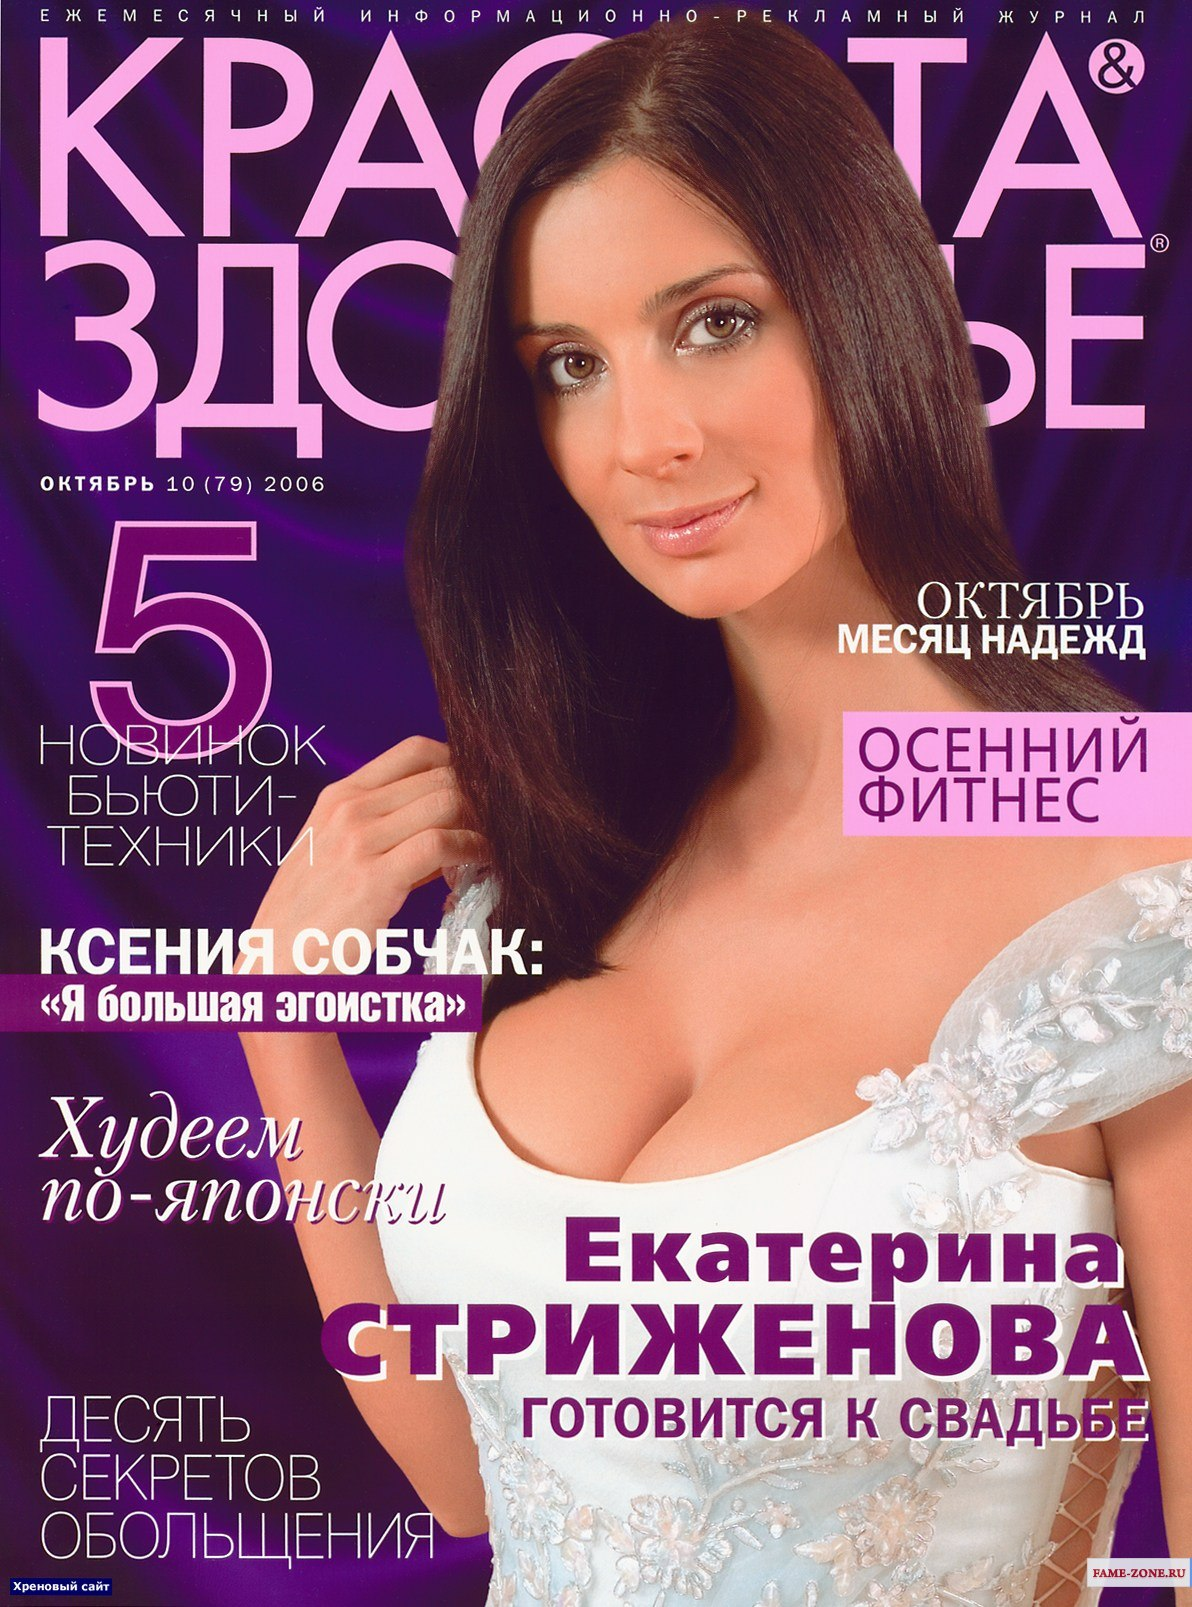 Фотография Екатерина Стриженова. Ekaterina Strizhenova